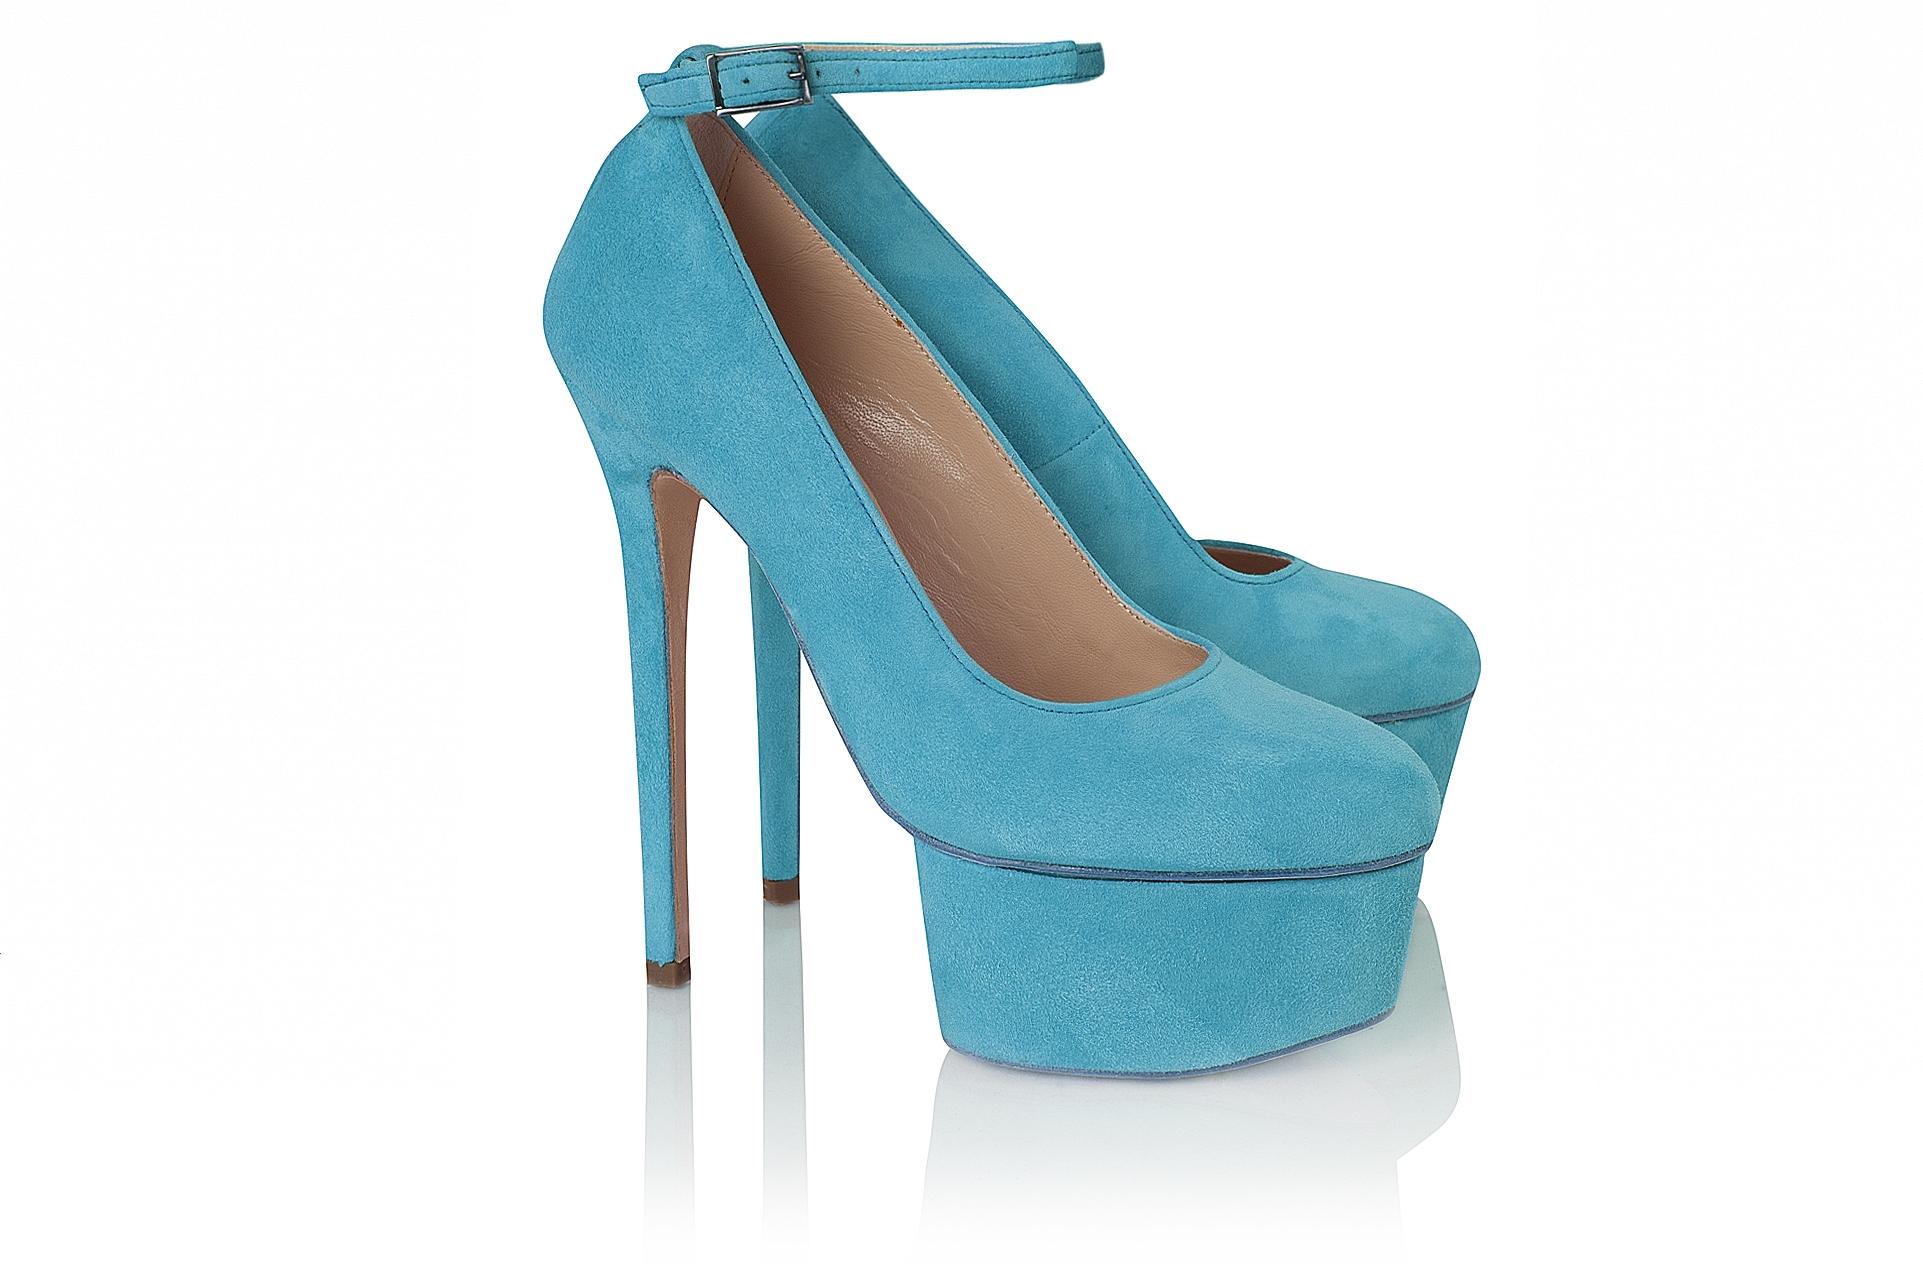 Ankle strap pump 6 inch - Shop - Olcay Gulsen